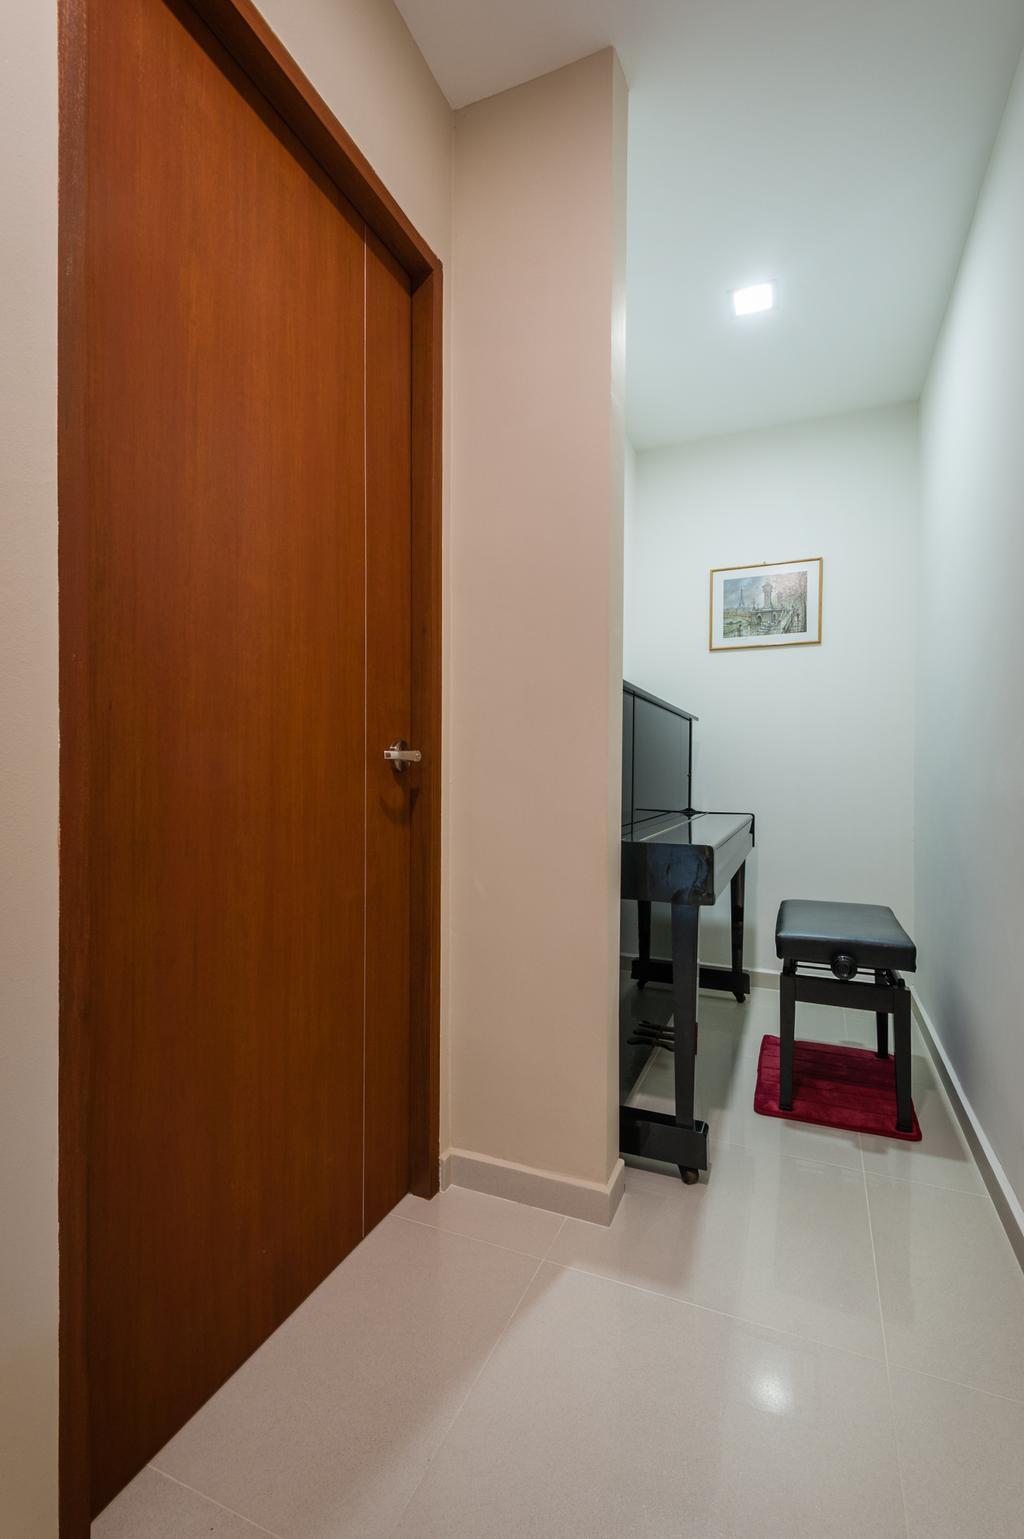 Traditional, HDB, Petir Road (Block 150), Interior Designer, Le Interi, Piano, Piano Room, Chair, Furniture, Art, Art Gallery, Dining Table, Table